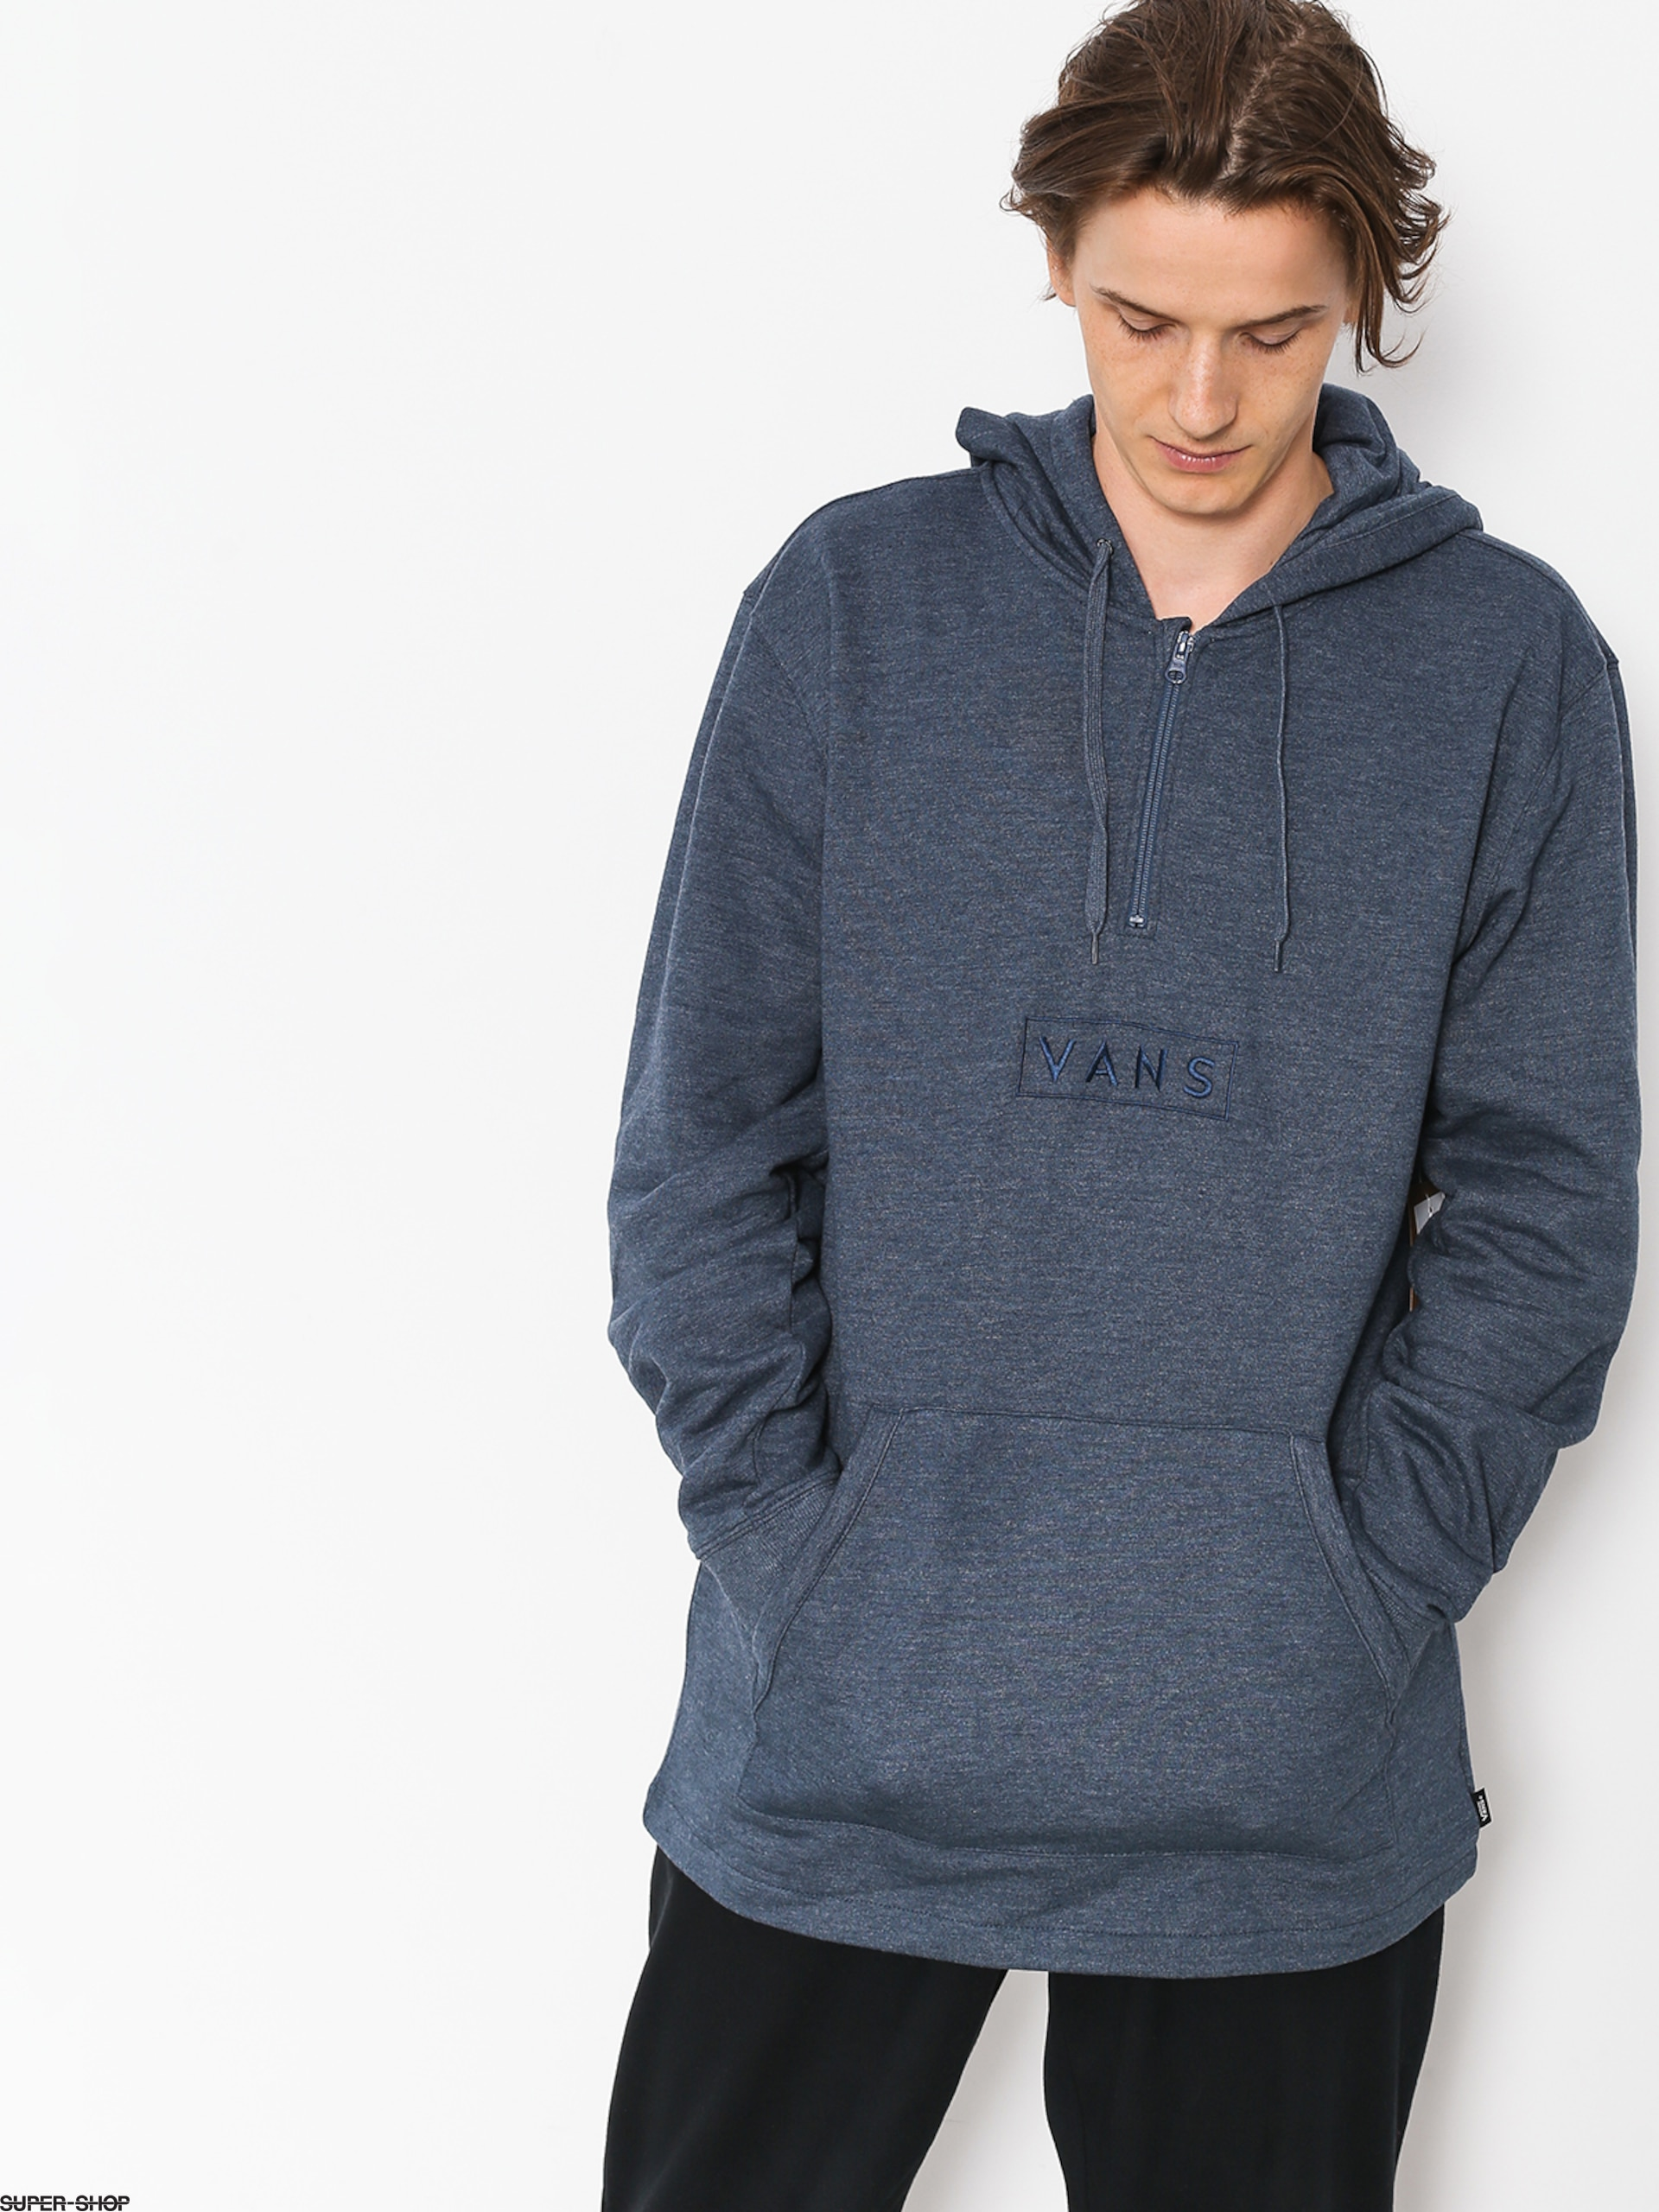 ffe2a82838b 971903-w1920-vans-sweatshirt-easy-box-qtr-zip-dress-blues-heather.jpg